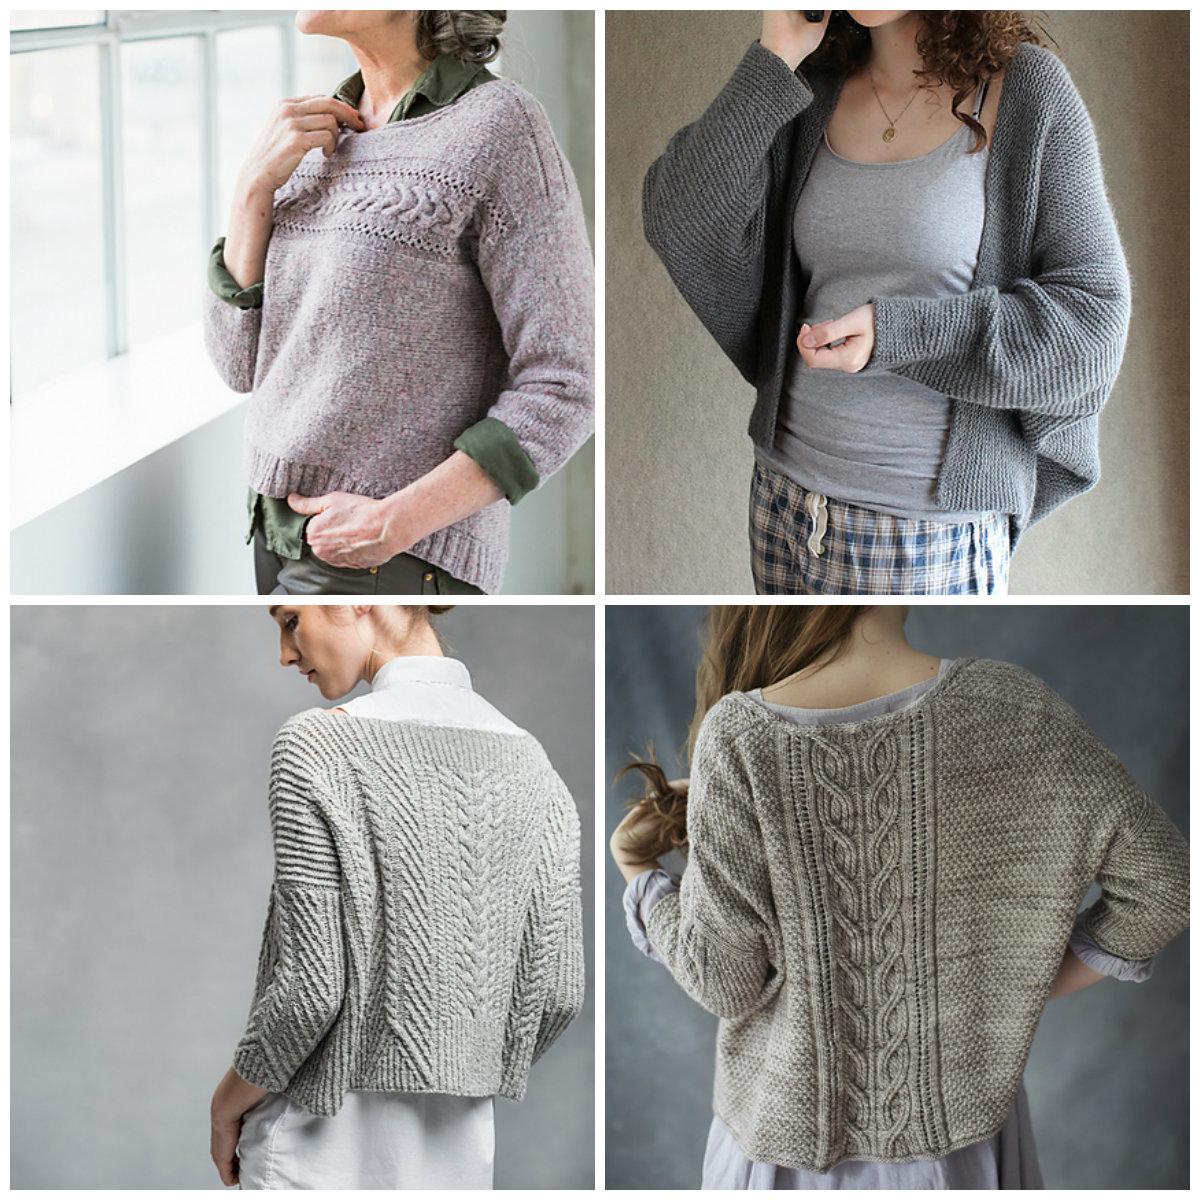 c1893149c064 Let s Talk about Construction  Sweaters (Part 2) - Stitch and Unwind